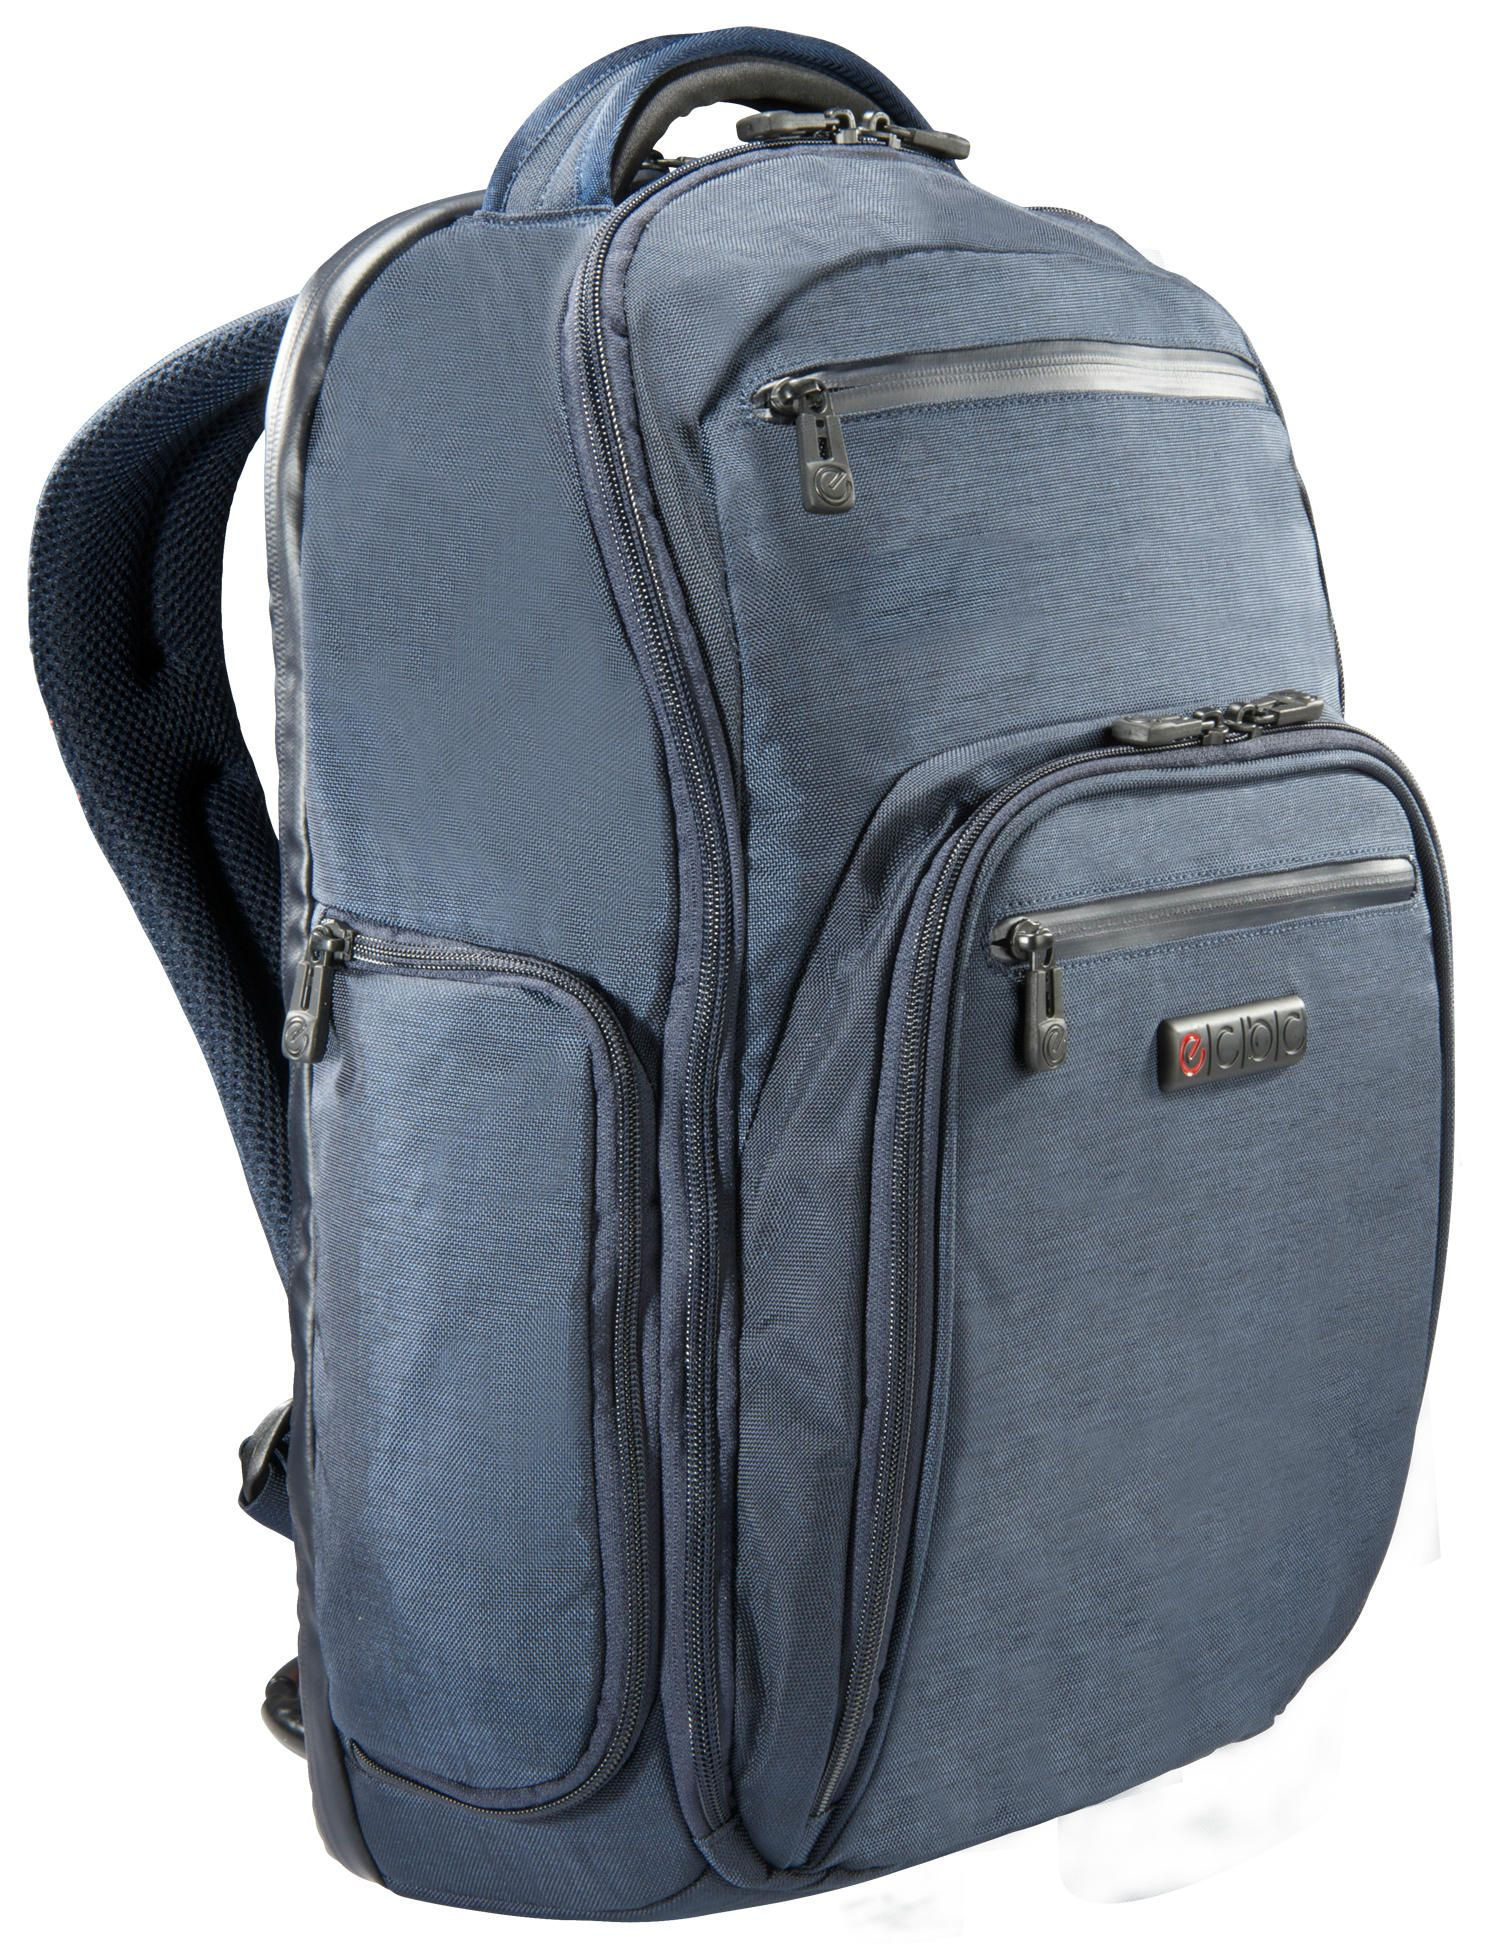 Ecbc k7 series hercules laptop backpack laptop backpack